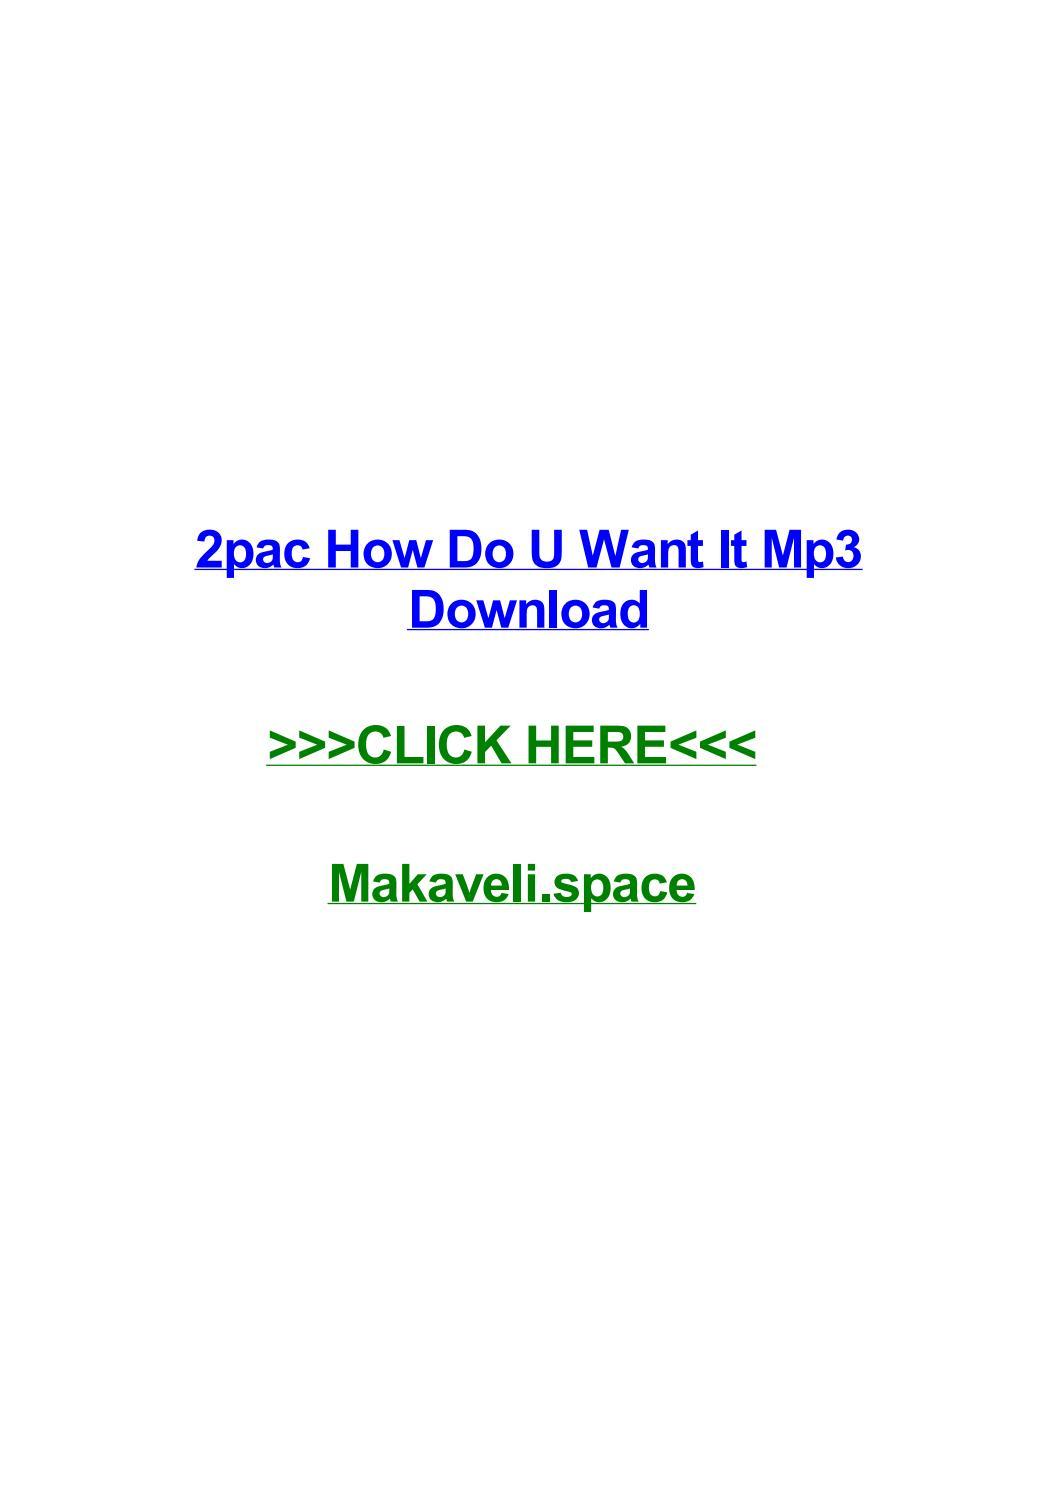 2pac how do u want it mp3 download by chadqlbbu - issuu